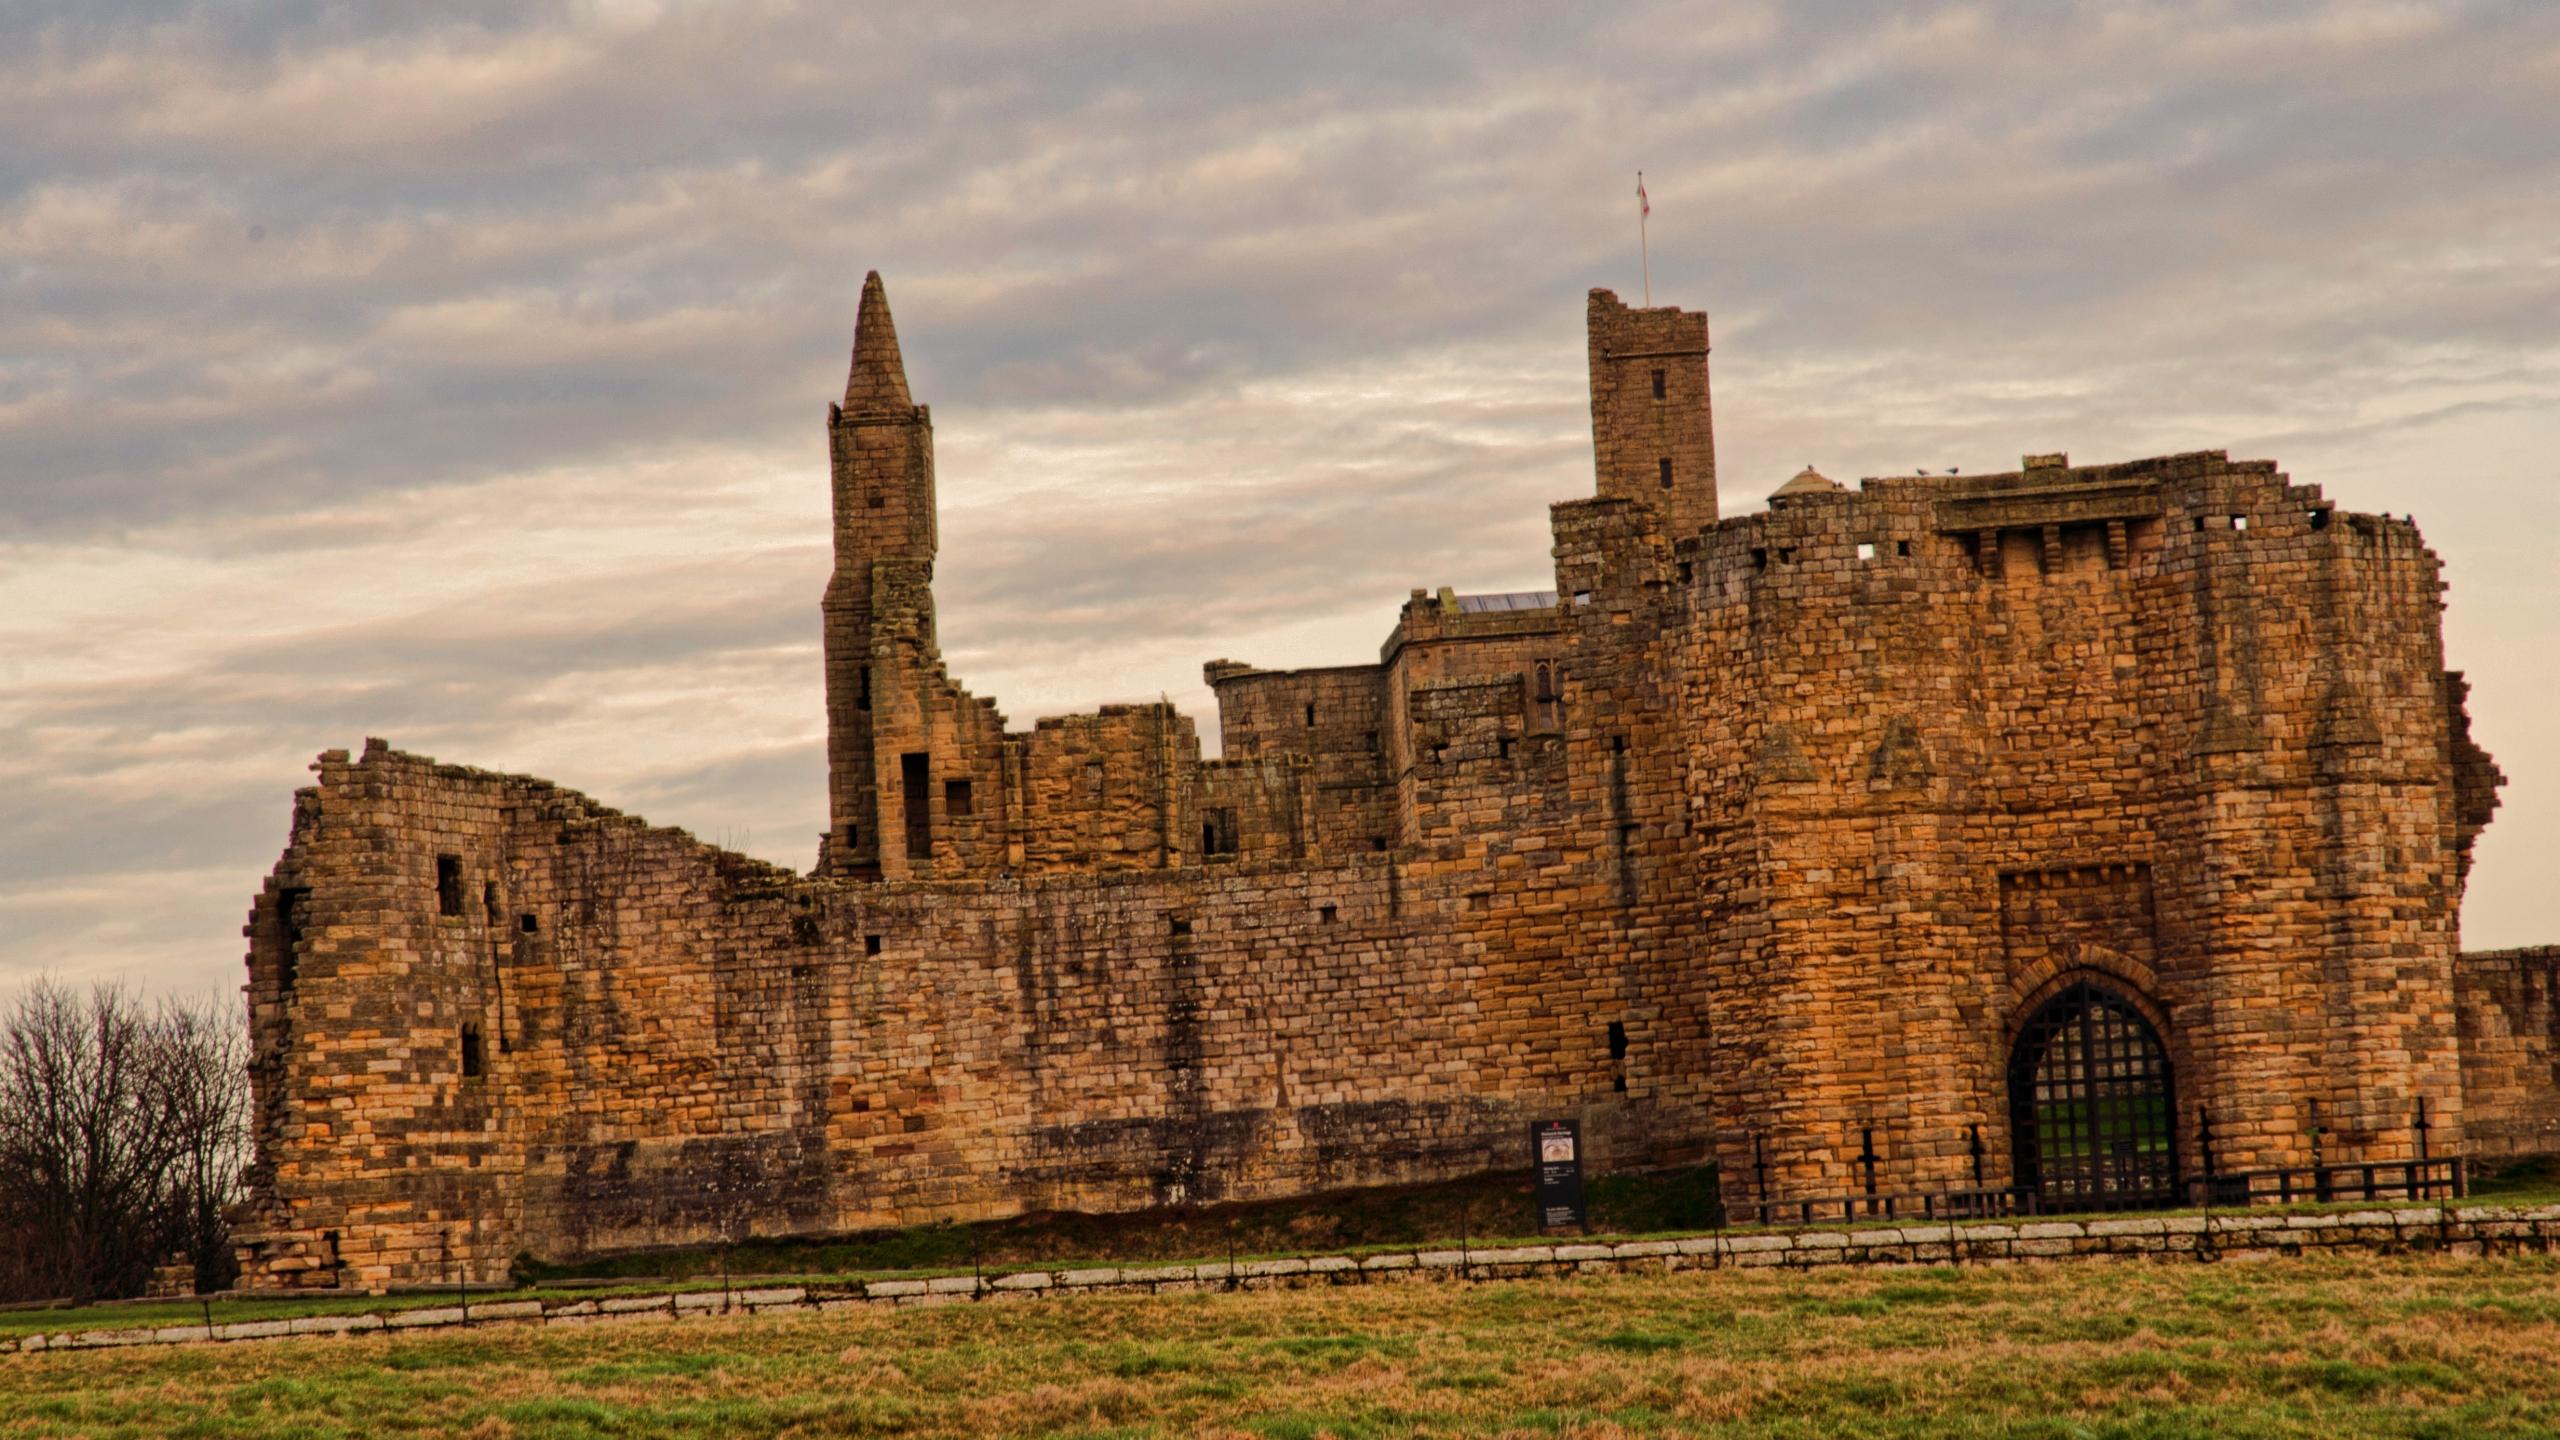 Man Made Warkworth Castle 2560x1440